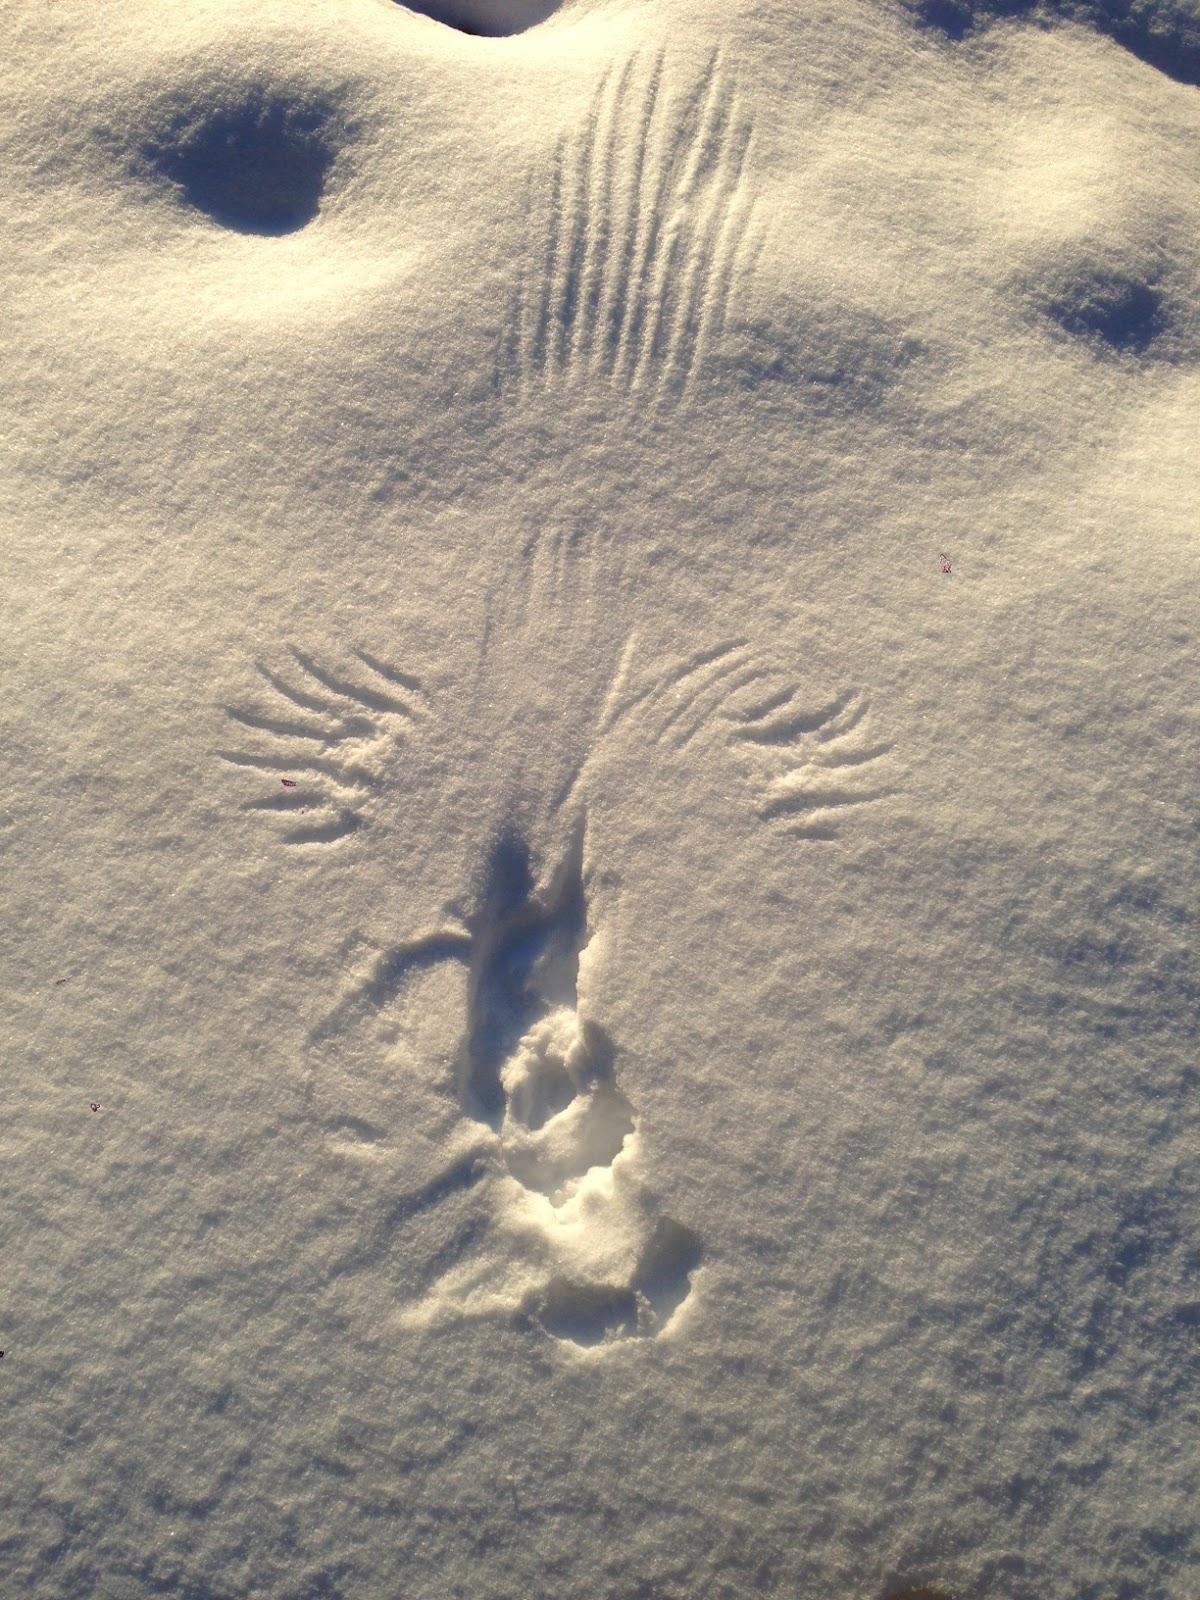 remote captures bird print on the snow